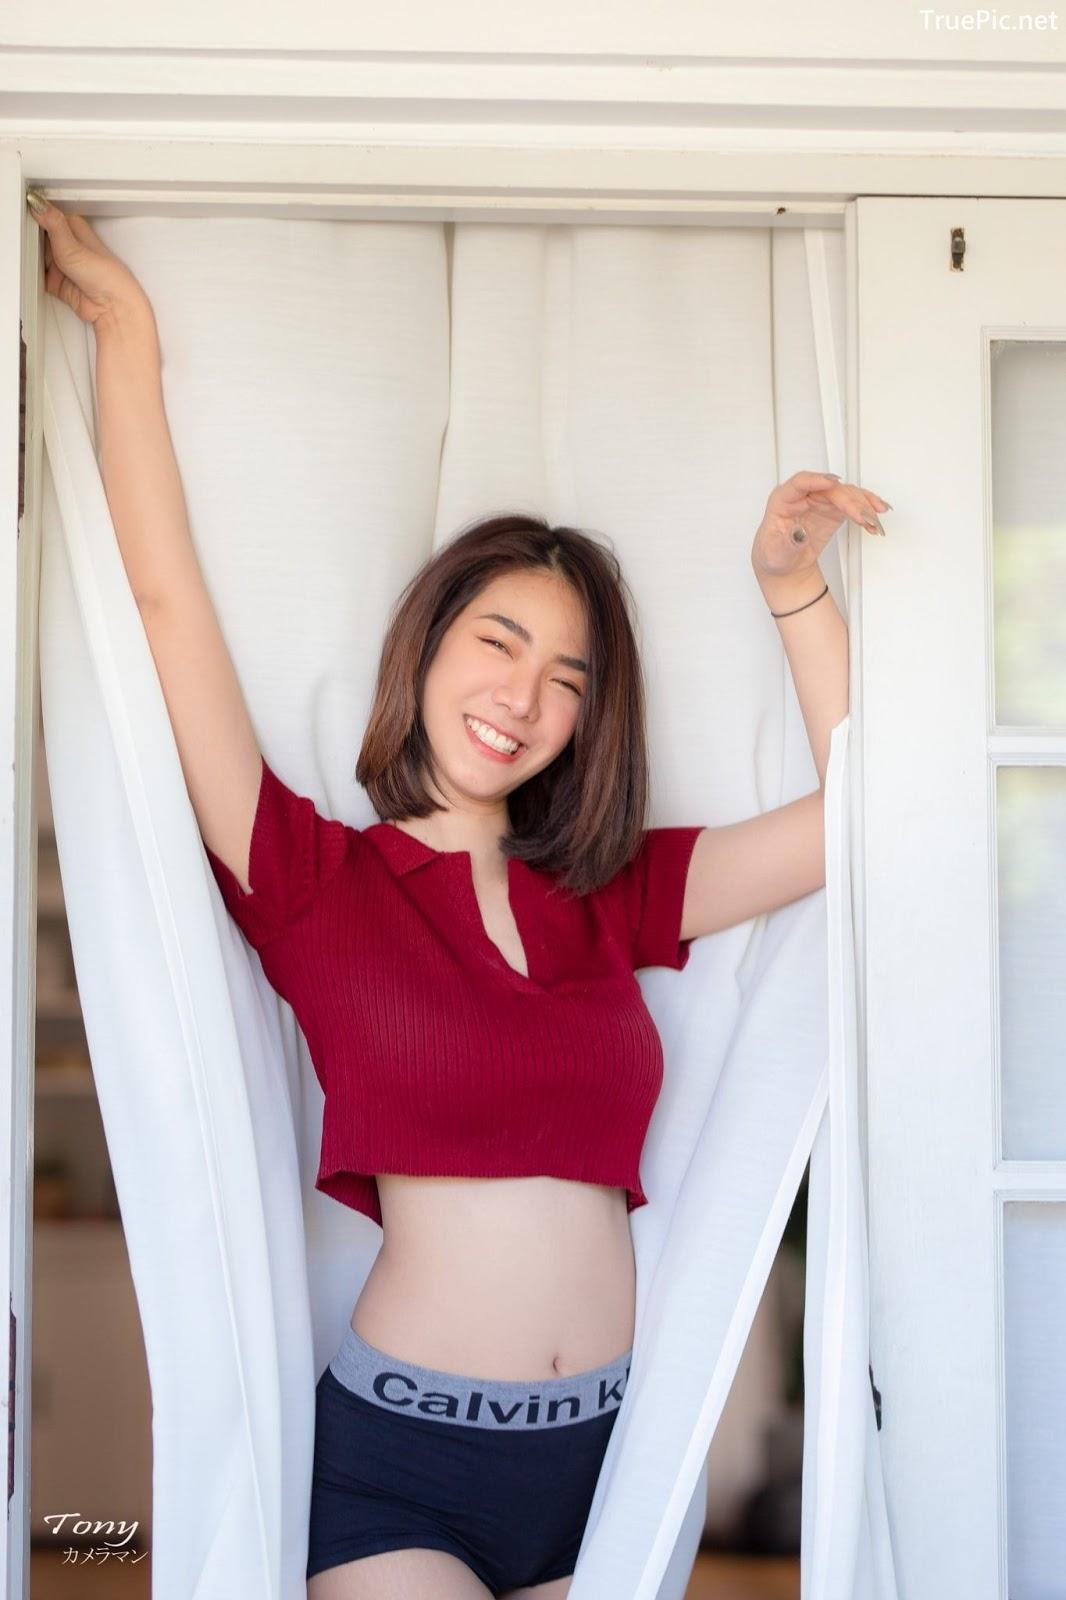 Image Thailand Model - Giekao Klaoruethai - CK Female Boxer - TruePic.net - Picture-1